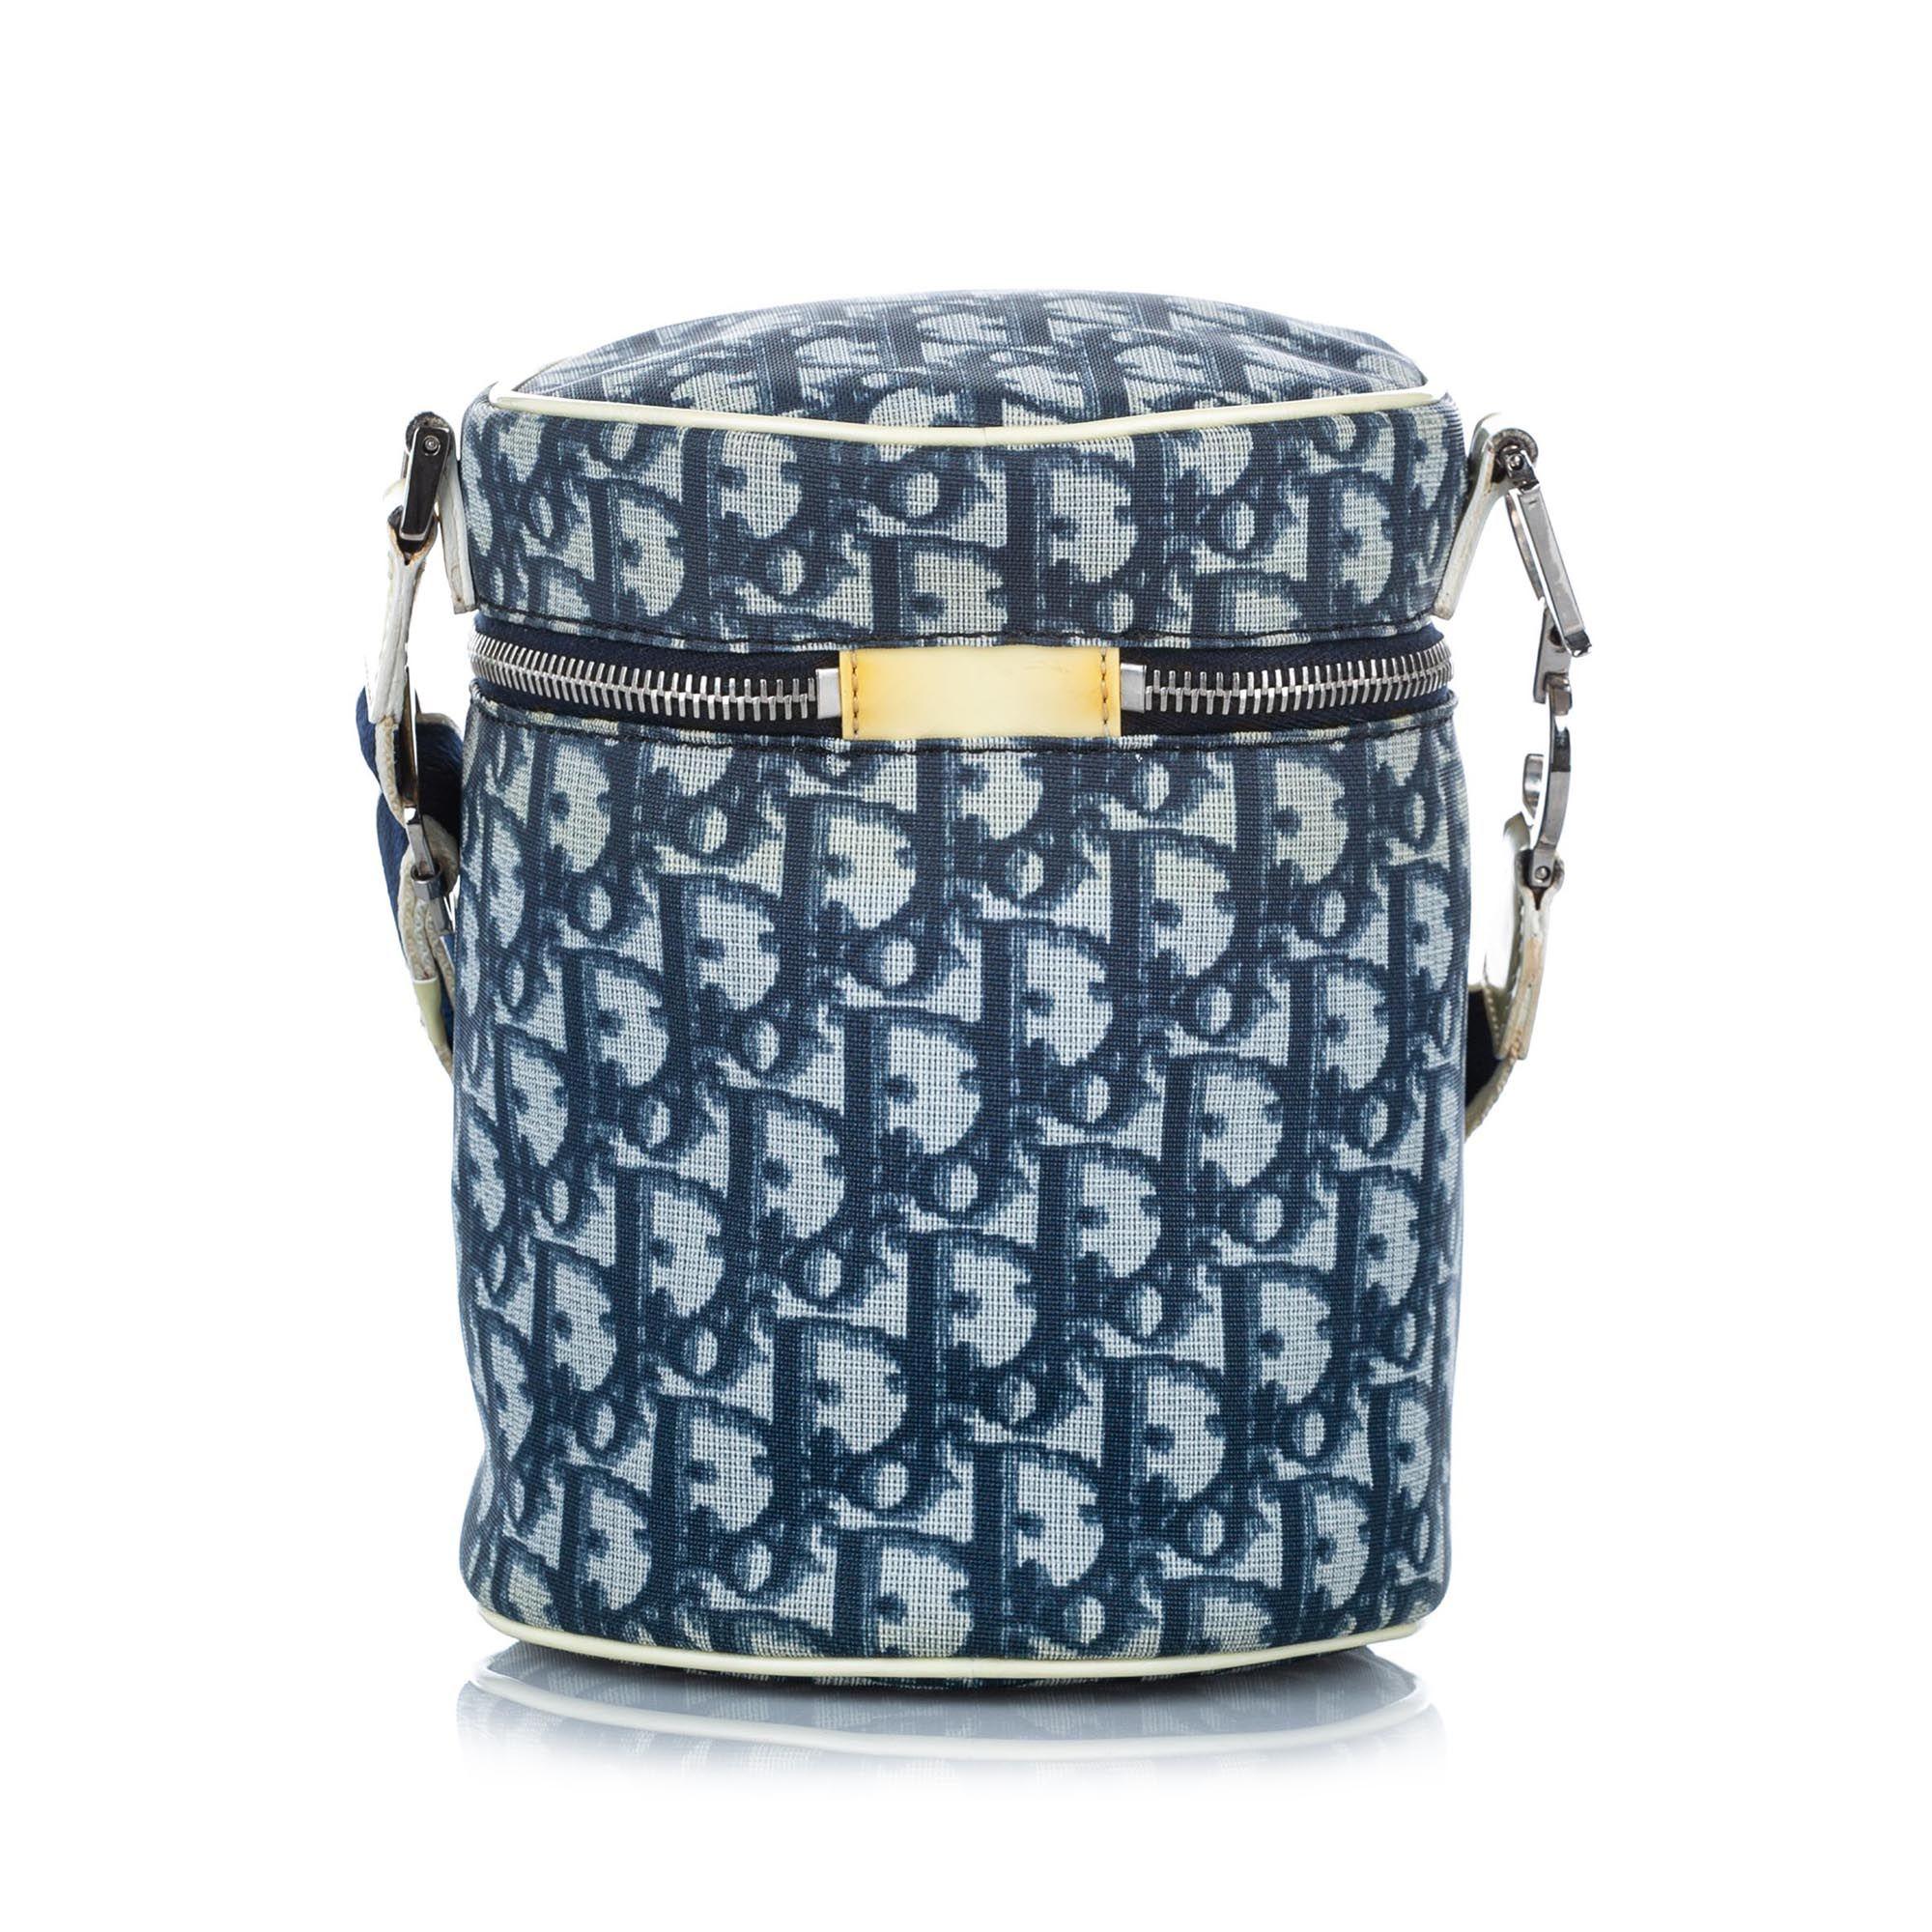 Vintage Dior Dior Oblique Trotter Canvas Bucket Bag Blue